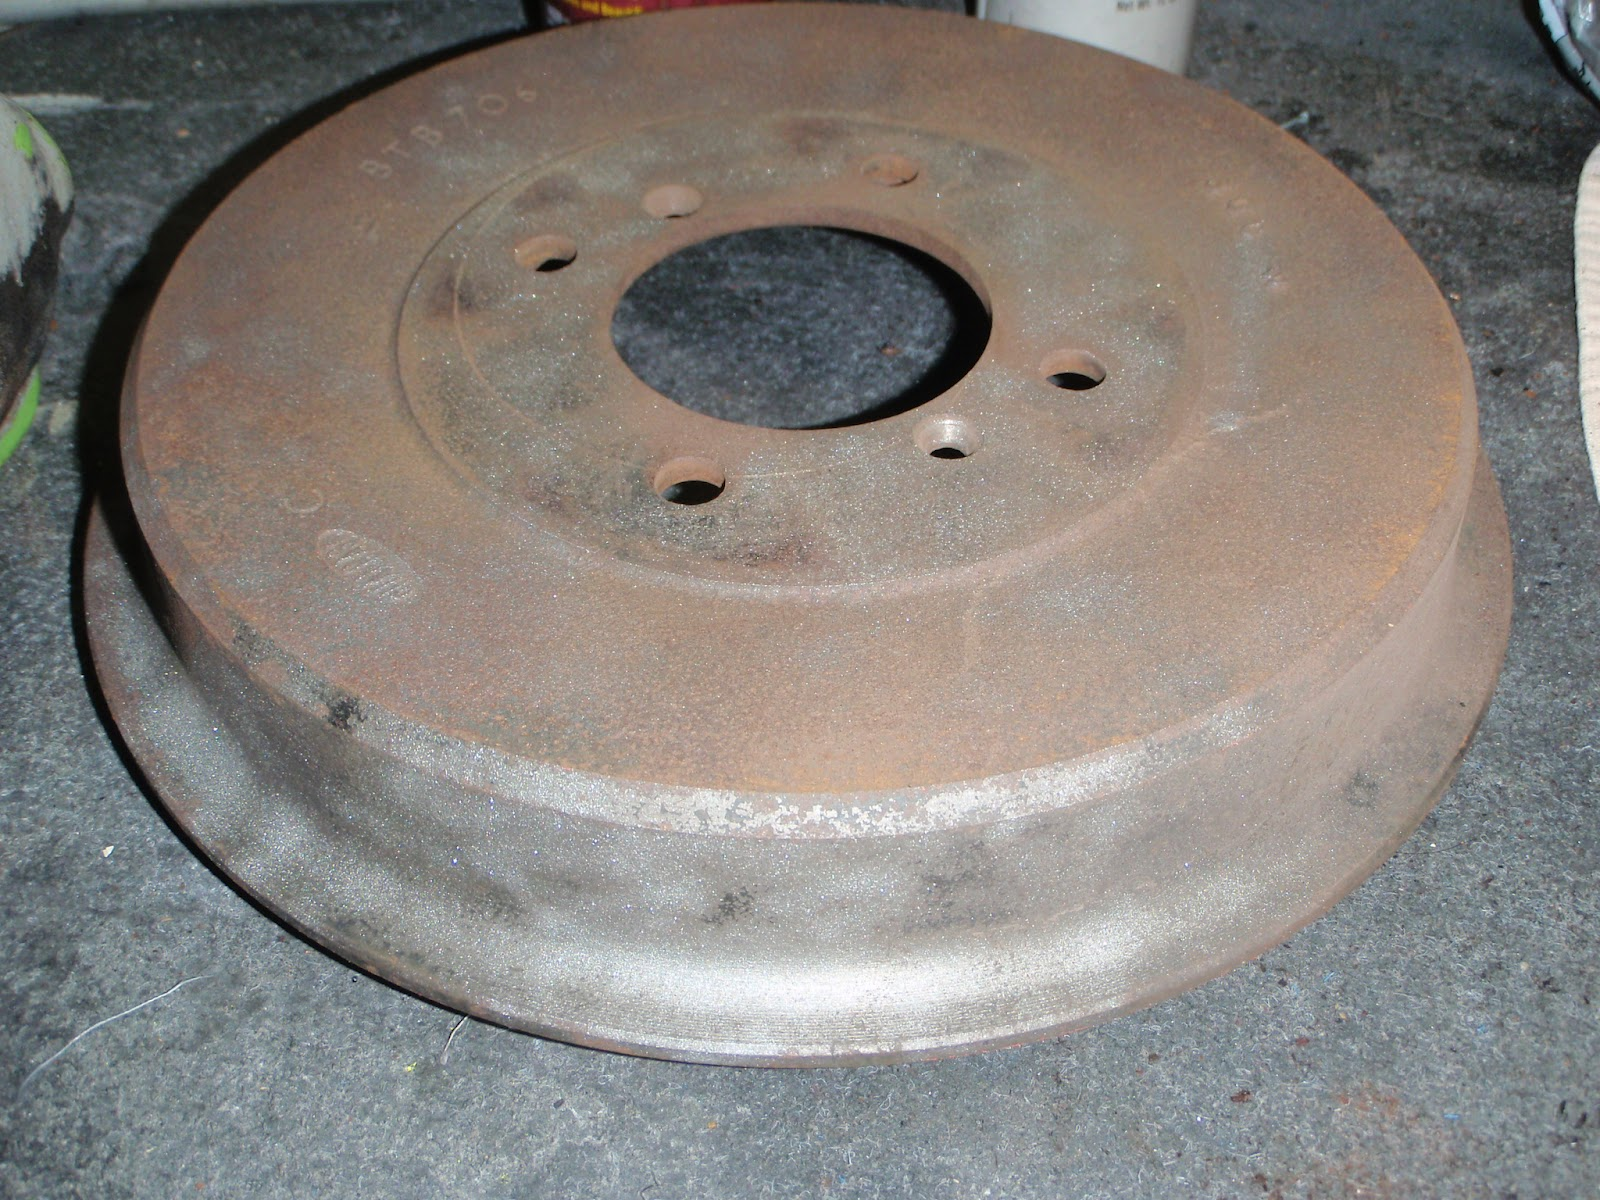 MGB in the Garage: Day 16, 17 brakes, floor prep, handbrake